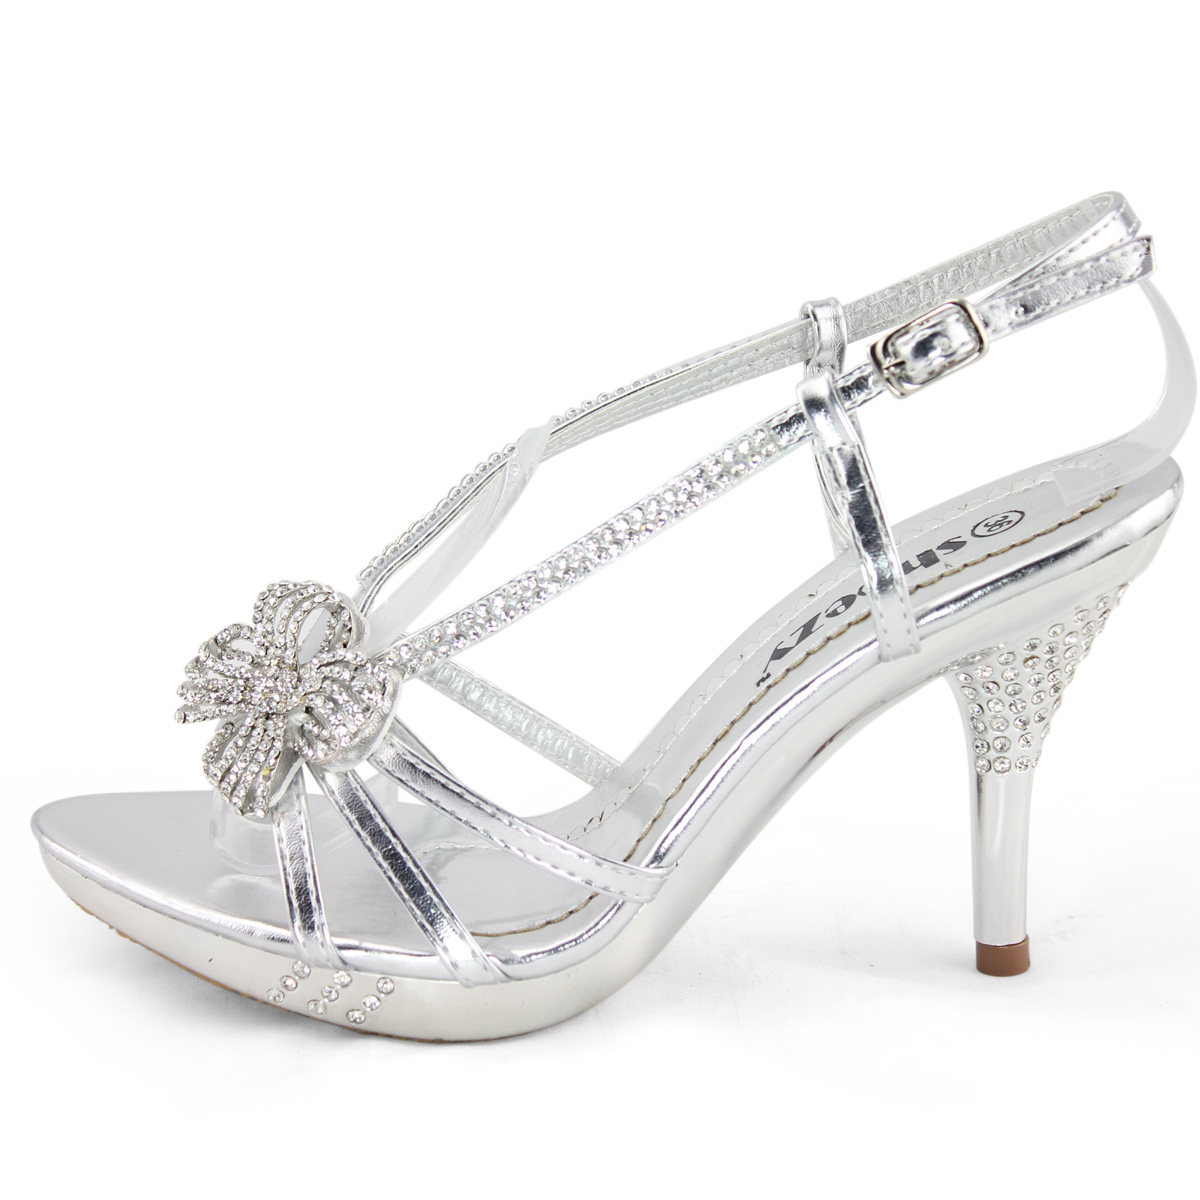 Laides silver satin diamante bridal wedding dresses platform heels shoes size 6